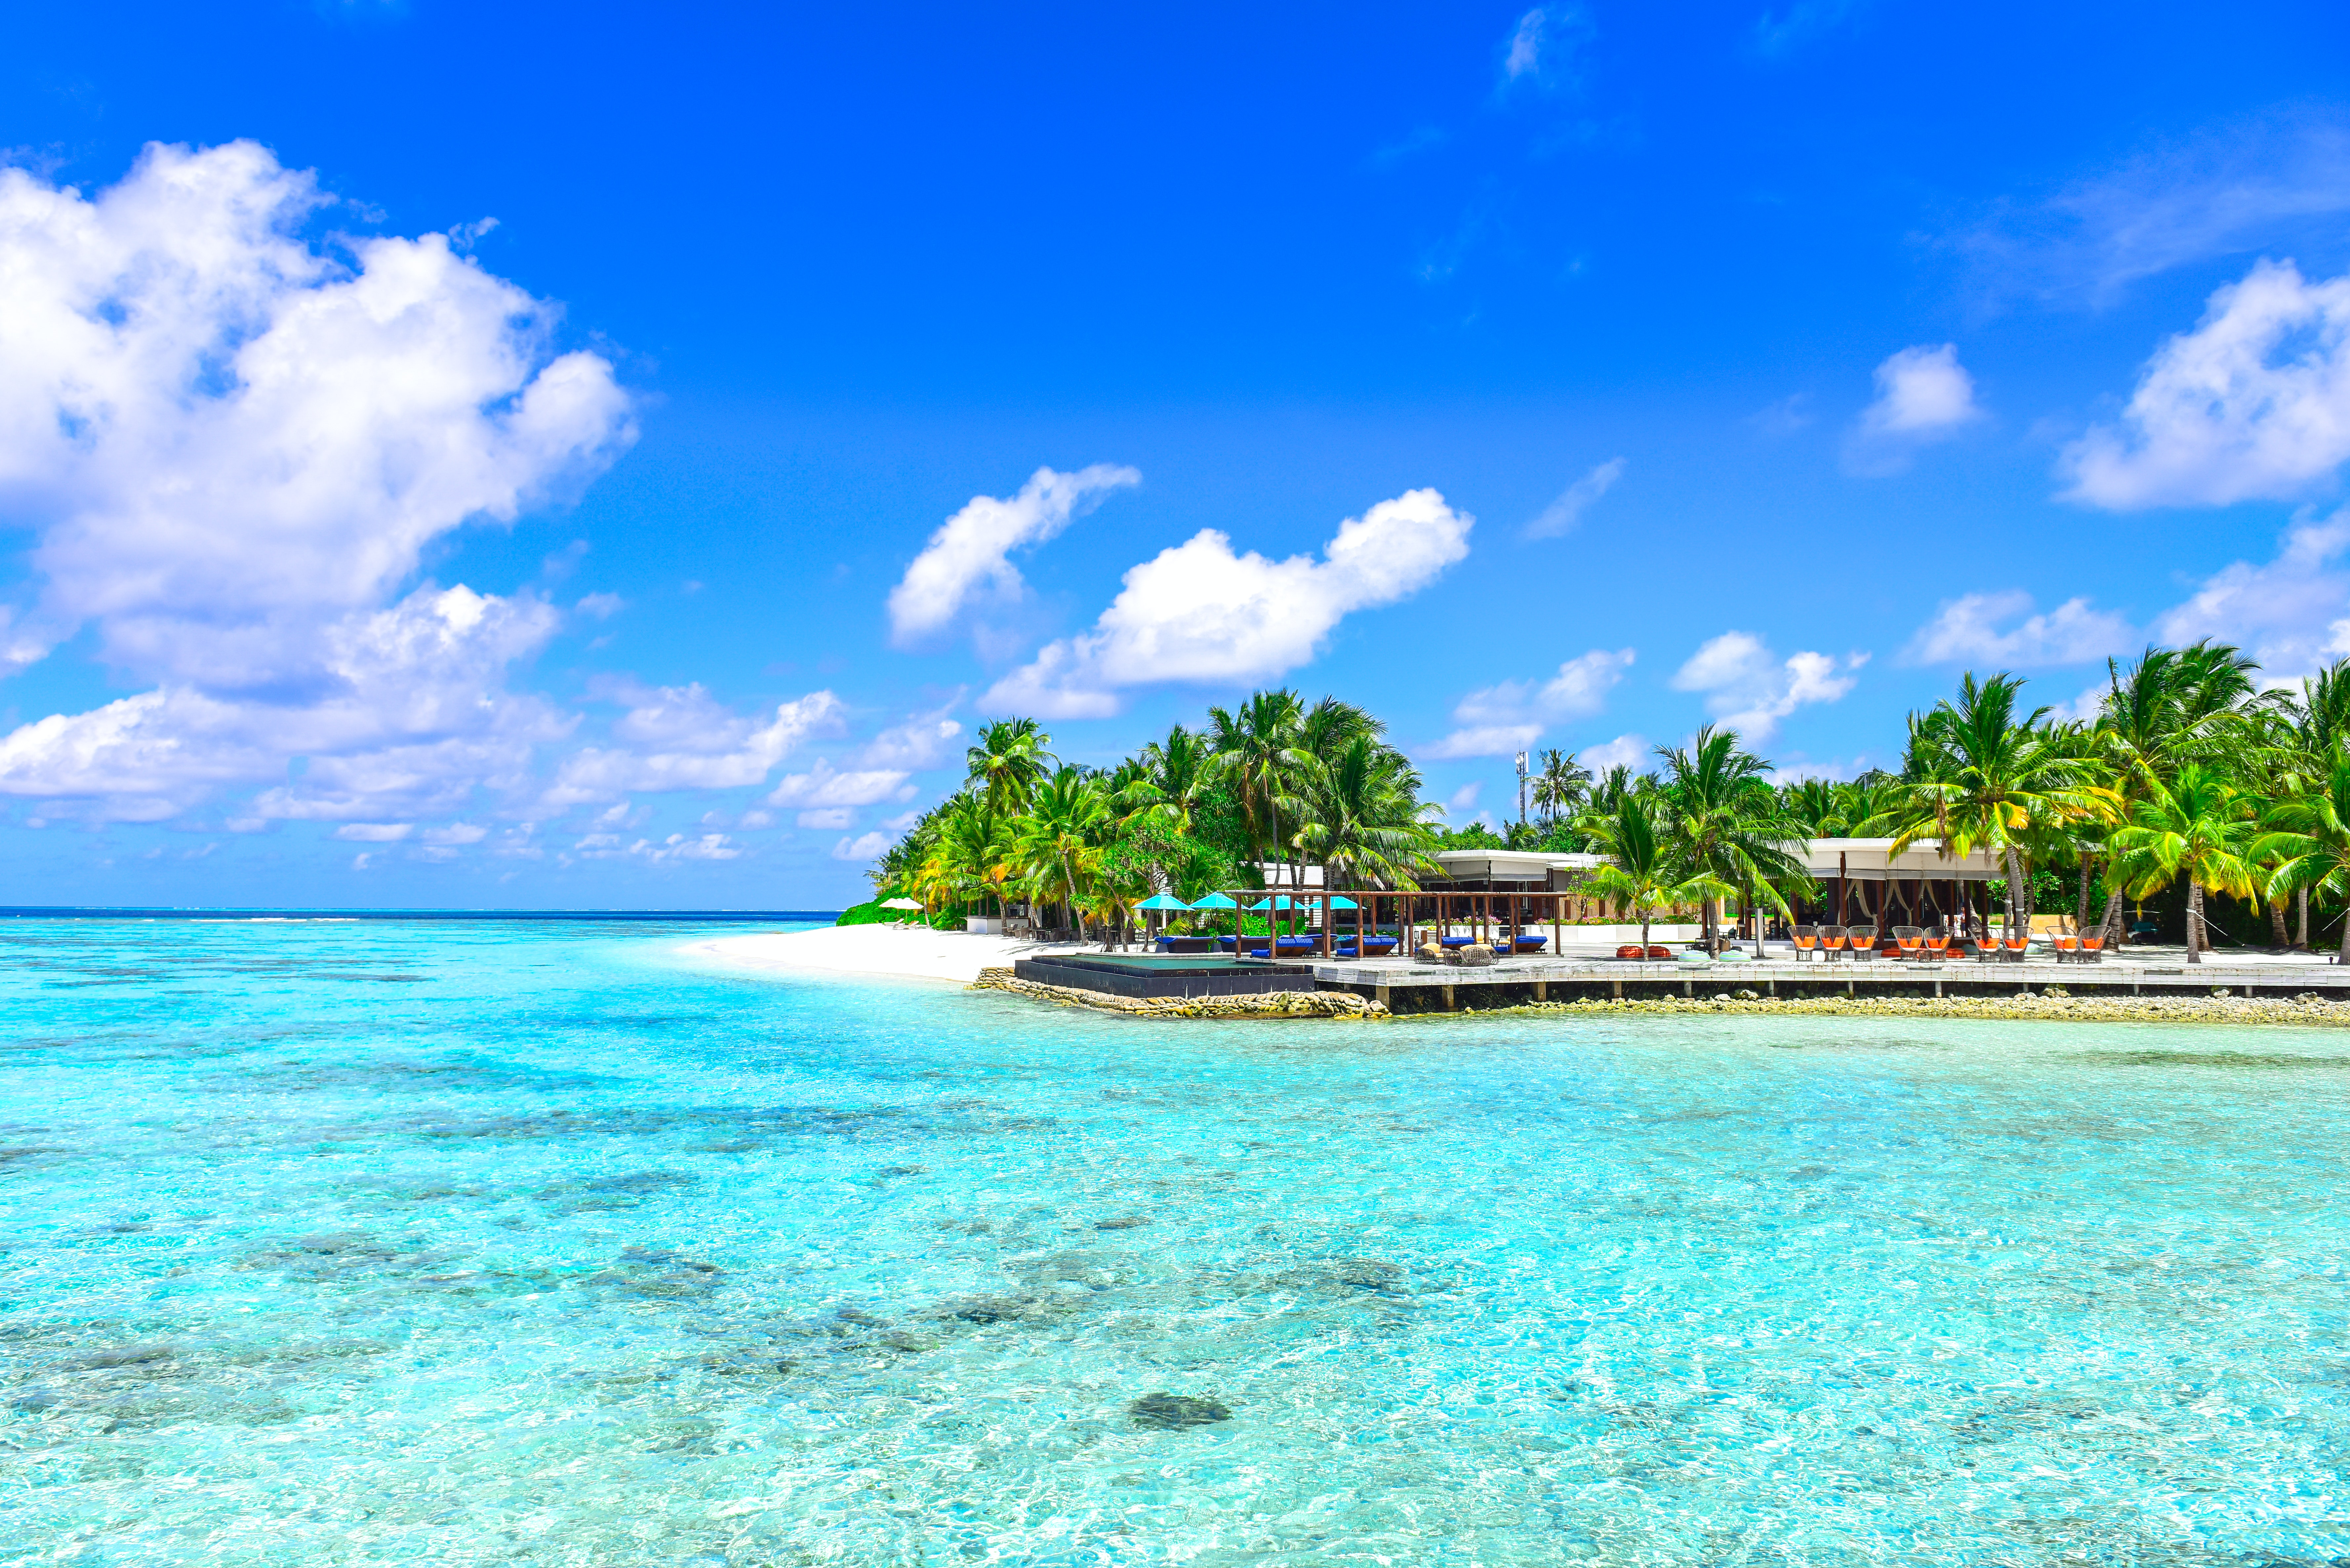 Photo of Seashore During Daytime by Asad Photo Maldives